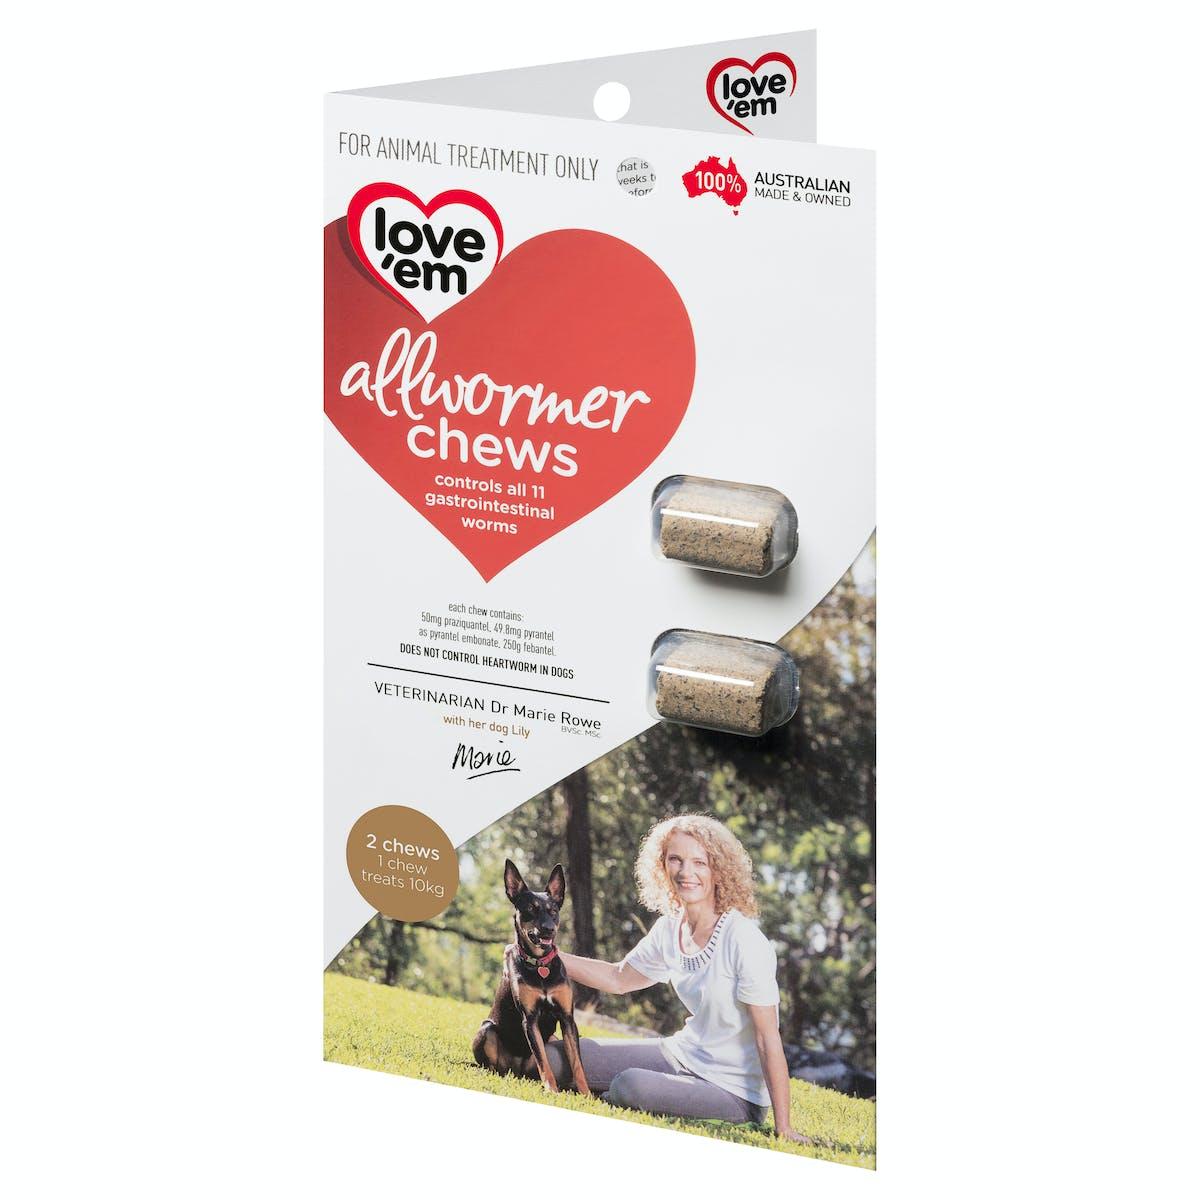 Love'em | all-wormer chews (medium) | Health dog | Front of pack